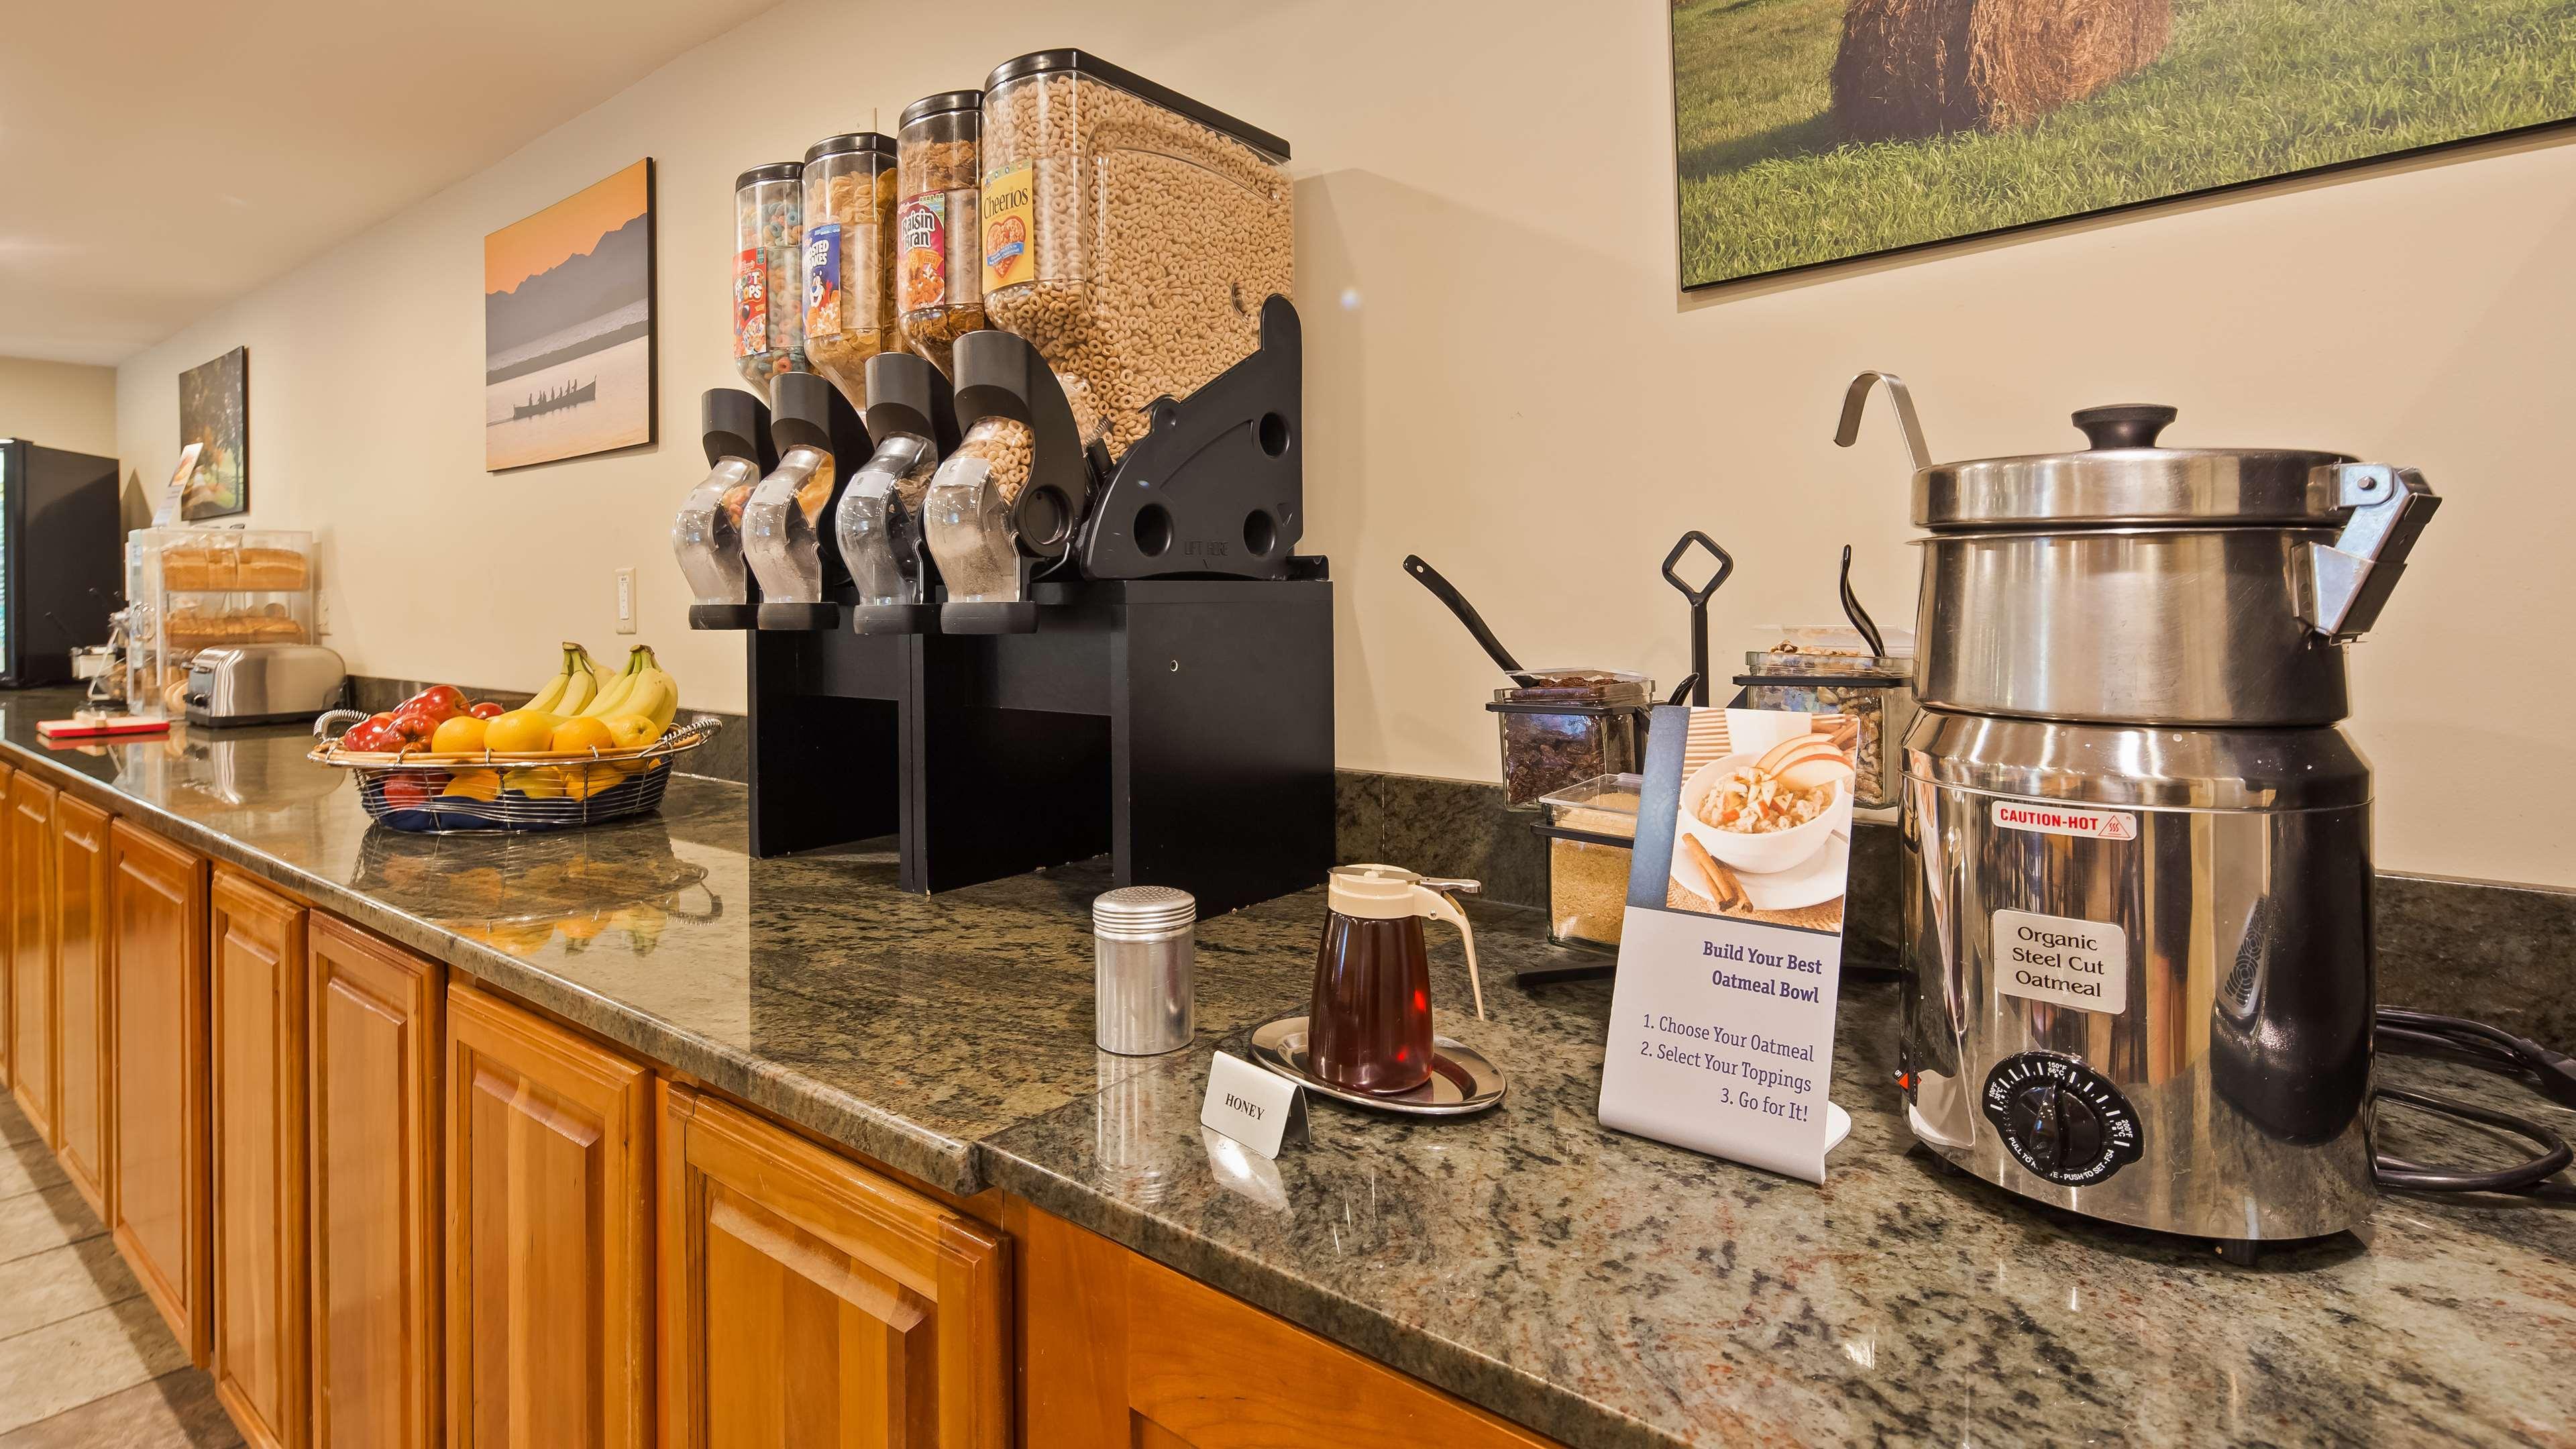 Best Western Plus Windjammer Inn & Conference Center image 2